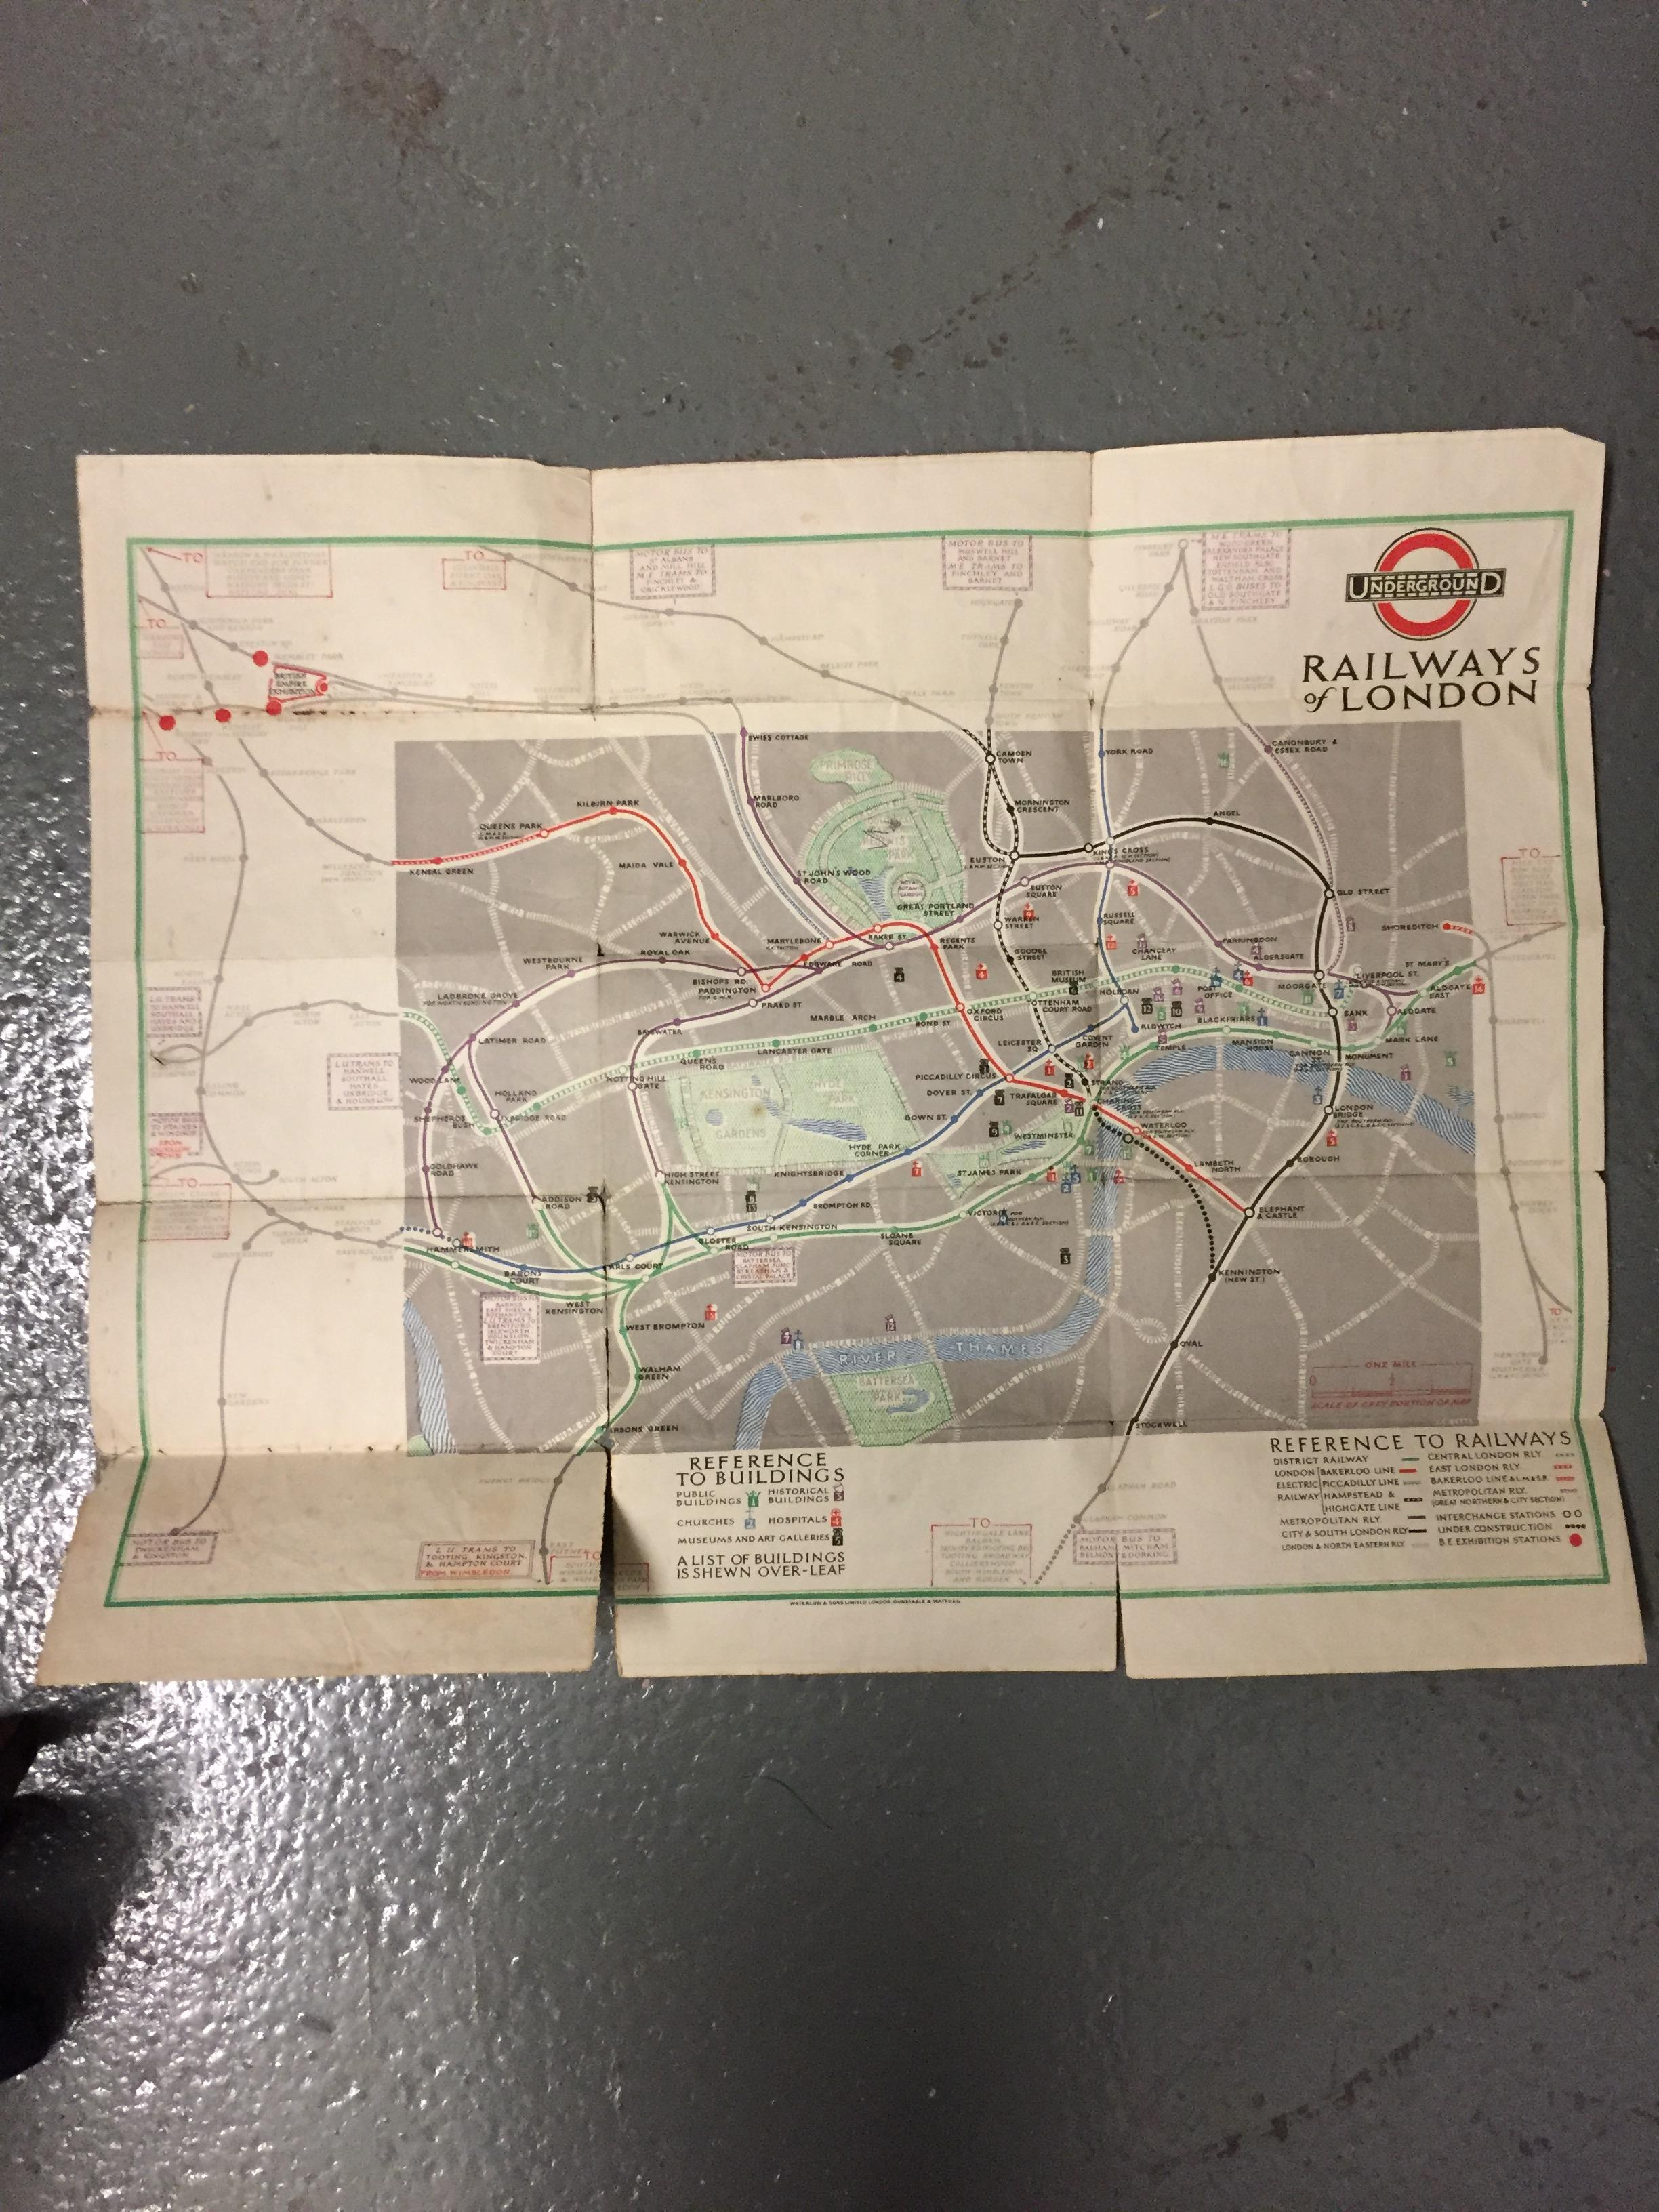 Nine 1910/20s folding pocket maps for London transport,comprising a 1916 General Omnibus Map of some - Image 11 of 15